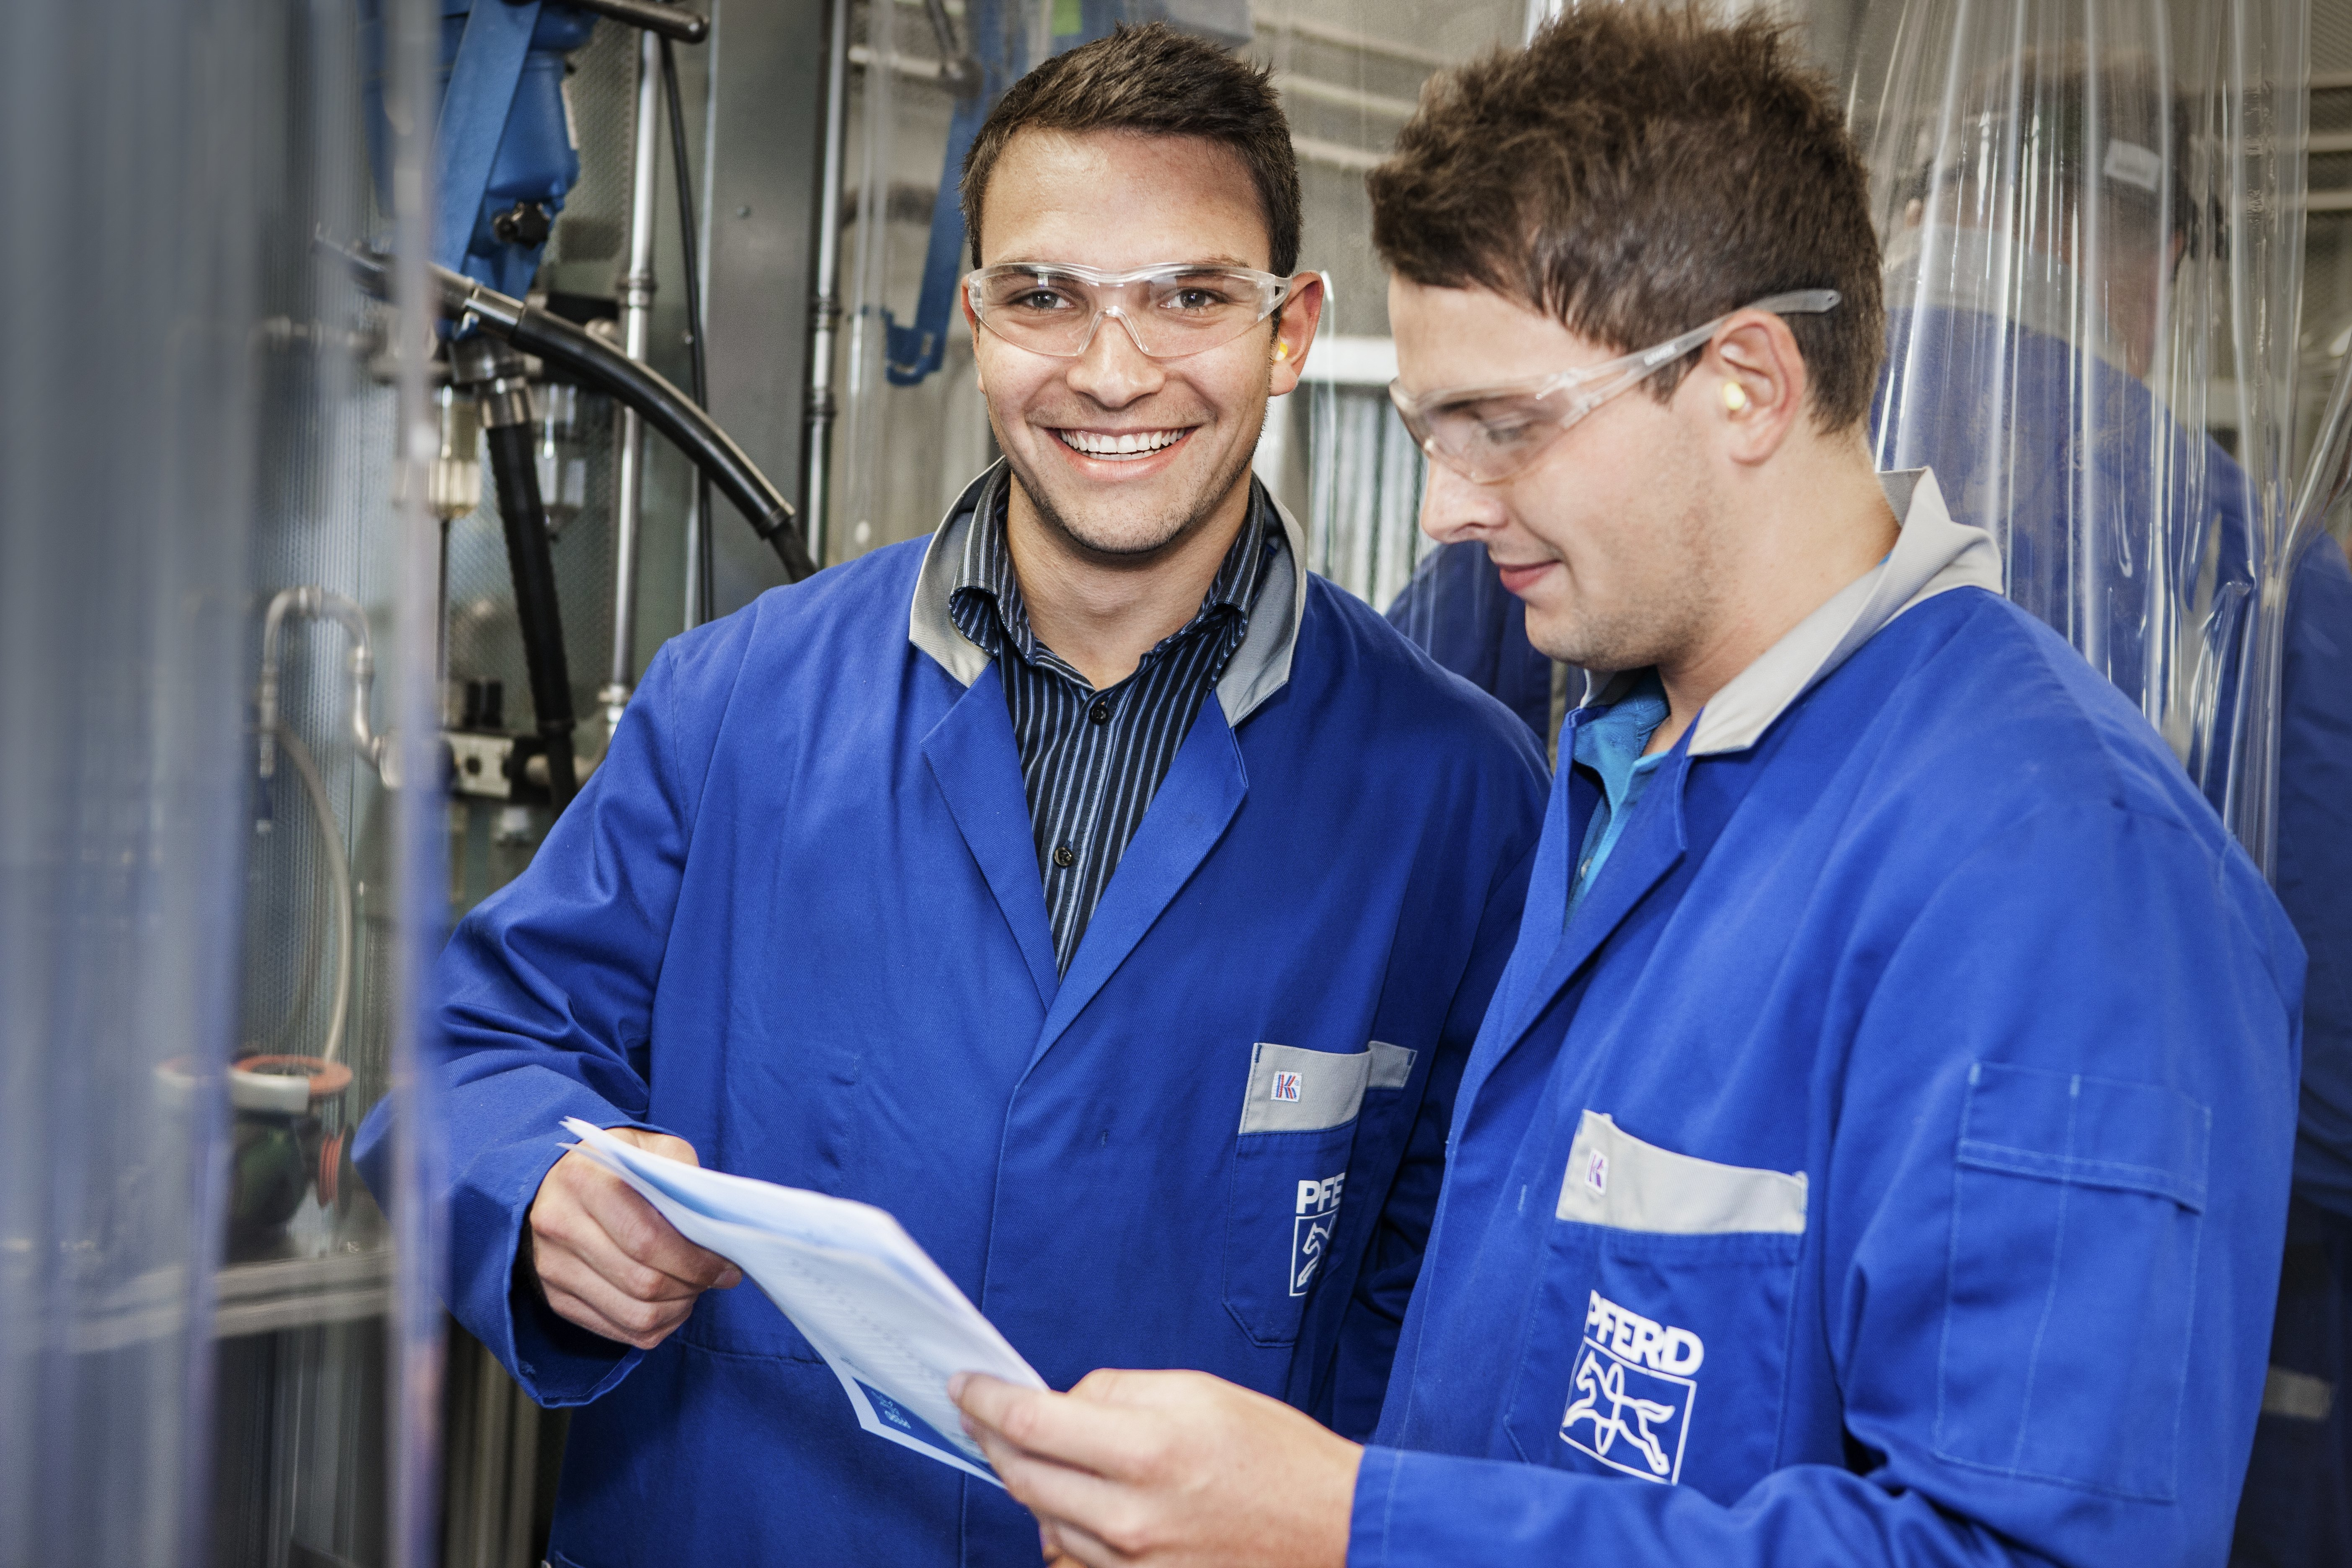 PFERD Akademie Training mit kompetentem Fachpersonal